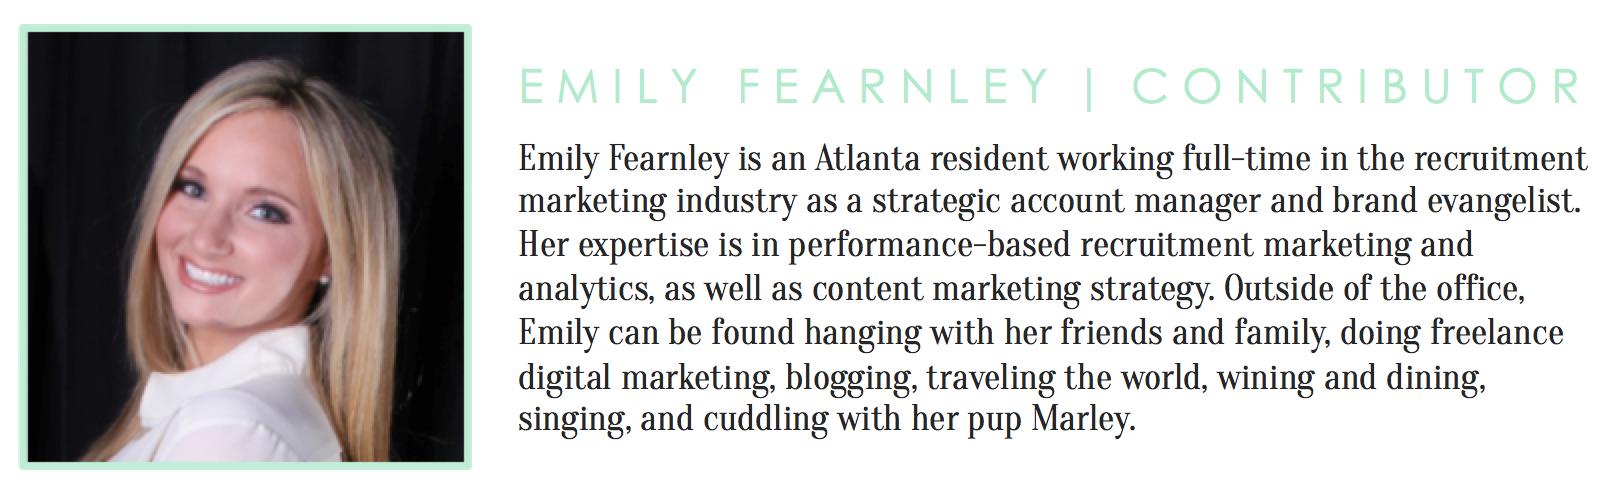 Emily Fearnley